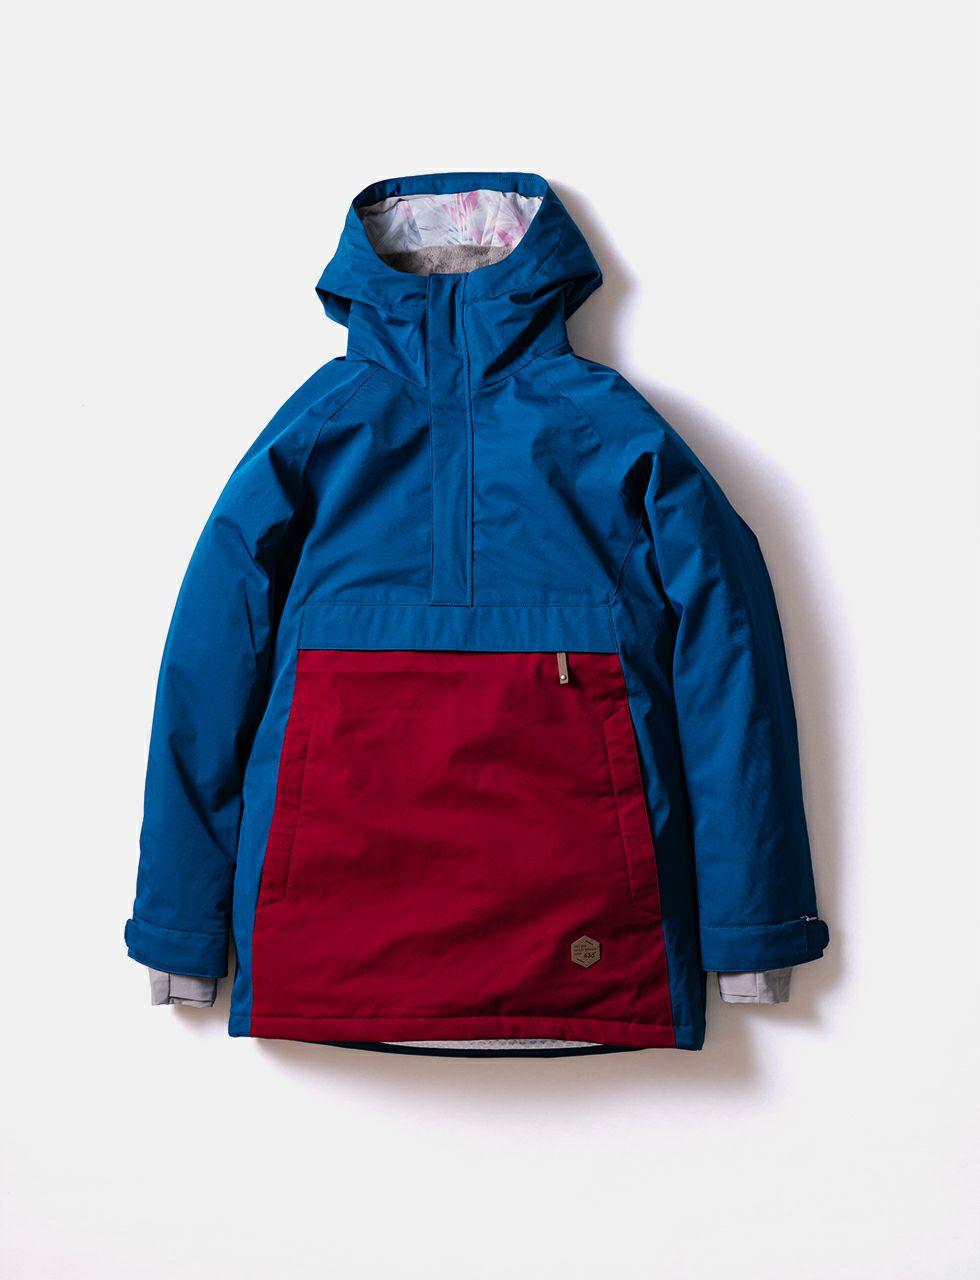 Anorak Jacket